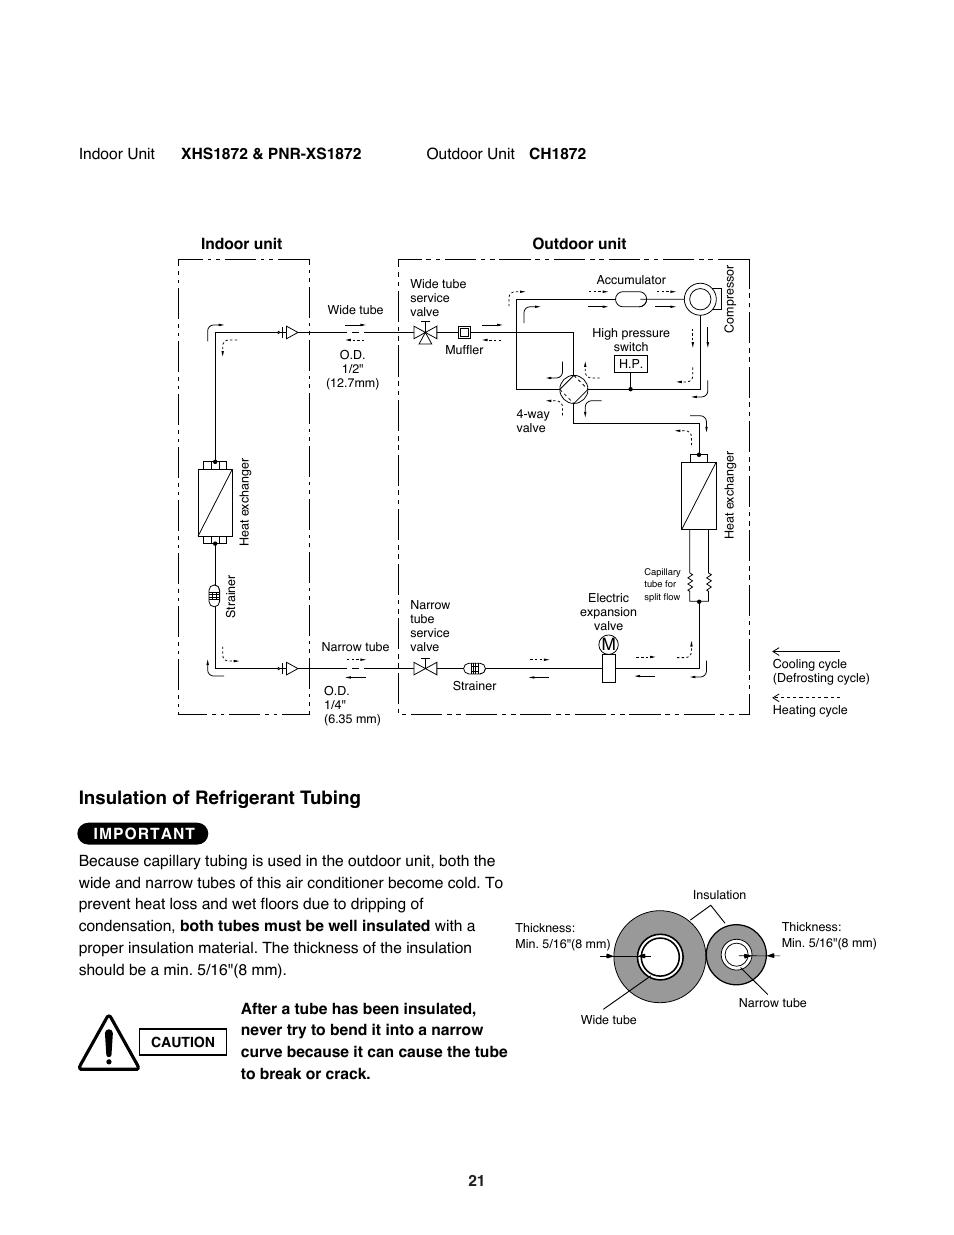 Insulation of refrigerant tubing | Sanyo DC Inverter Split System XHS1271 User  Manual | Page 21